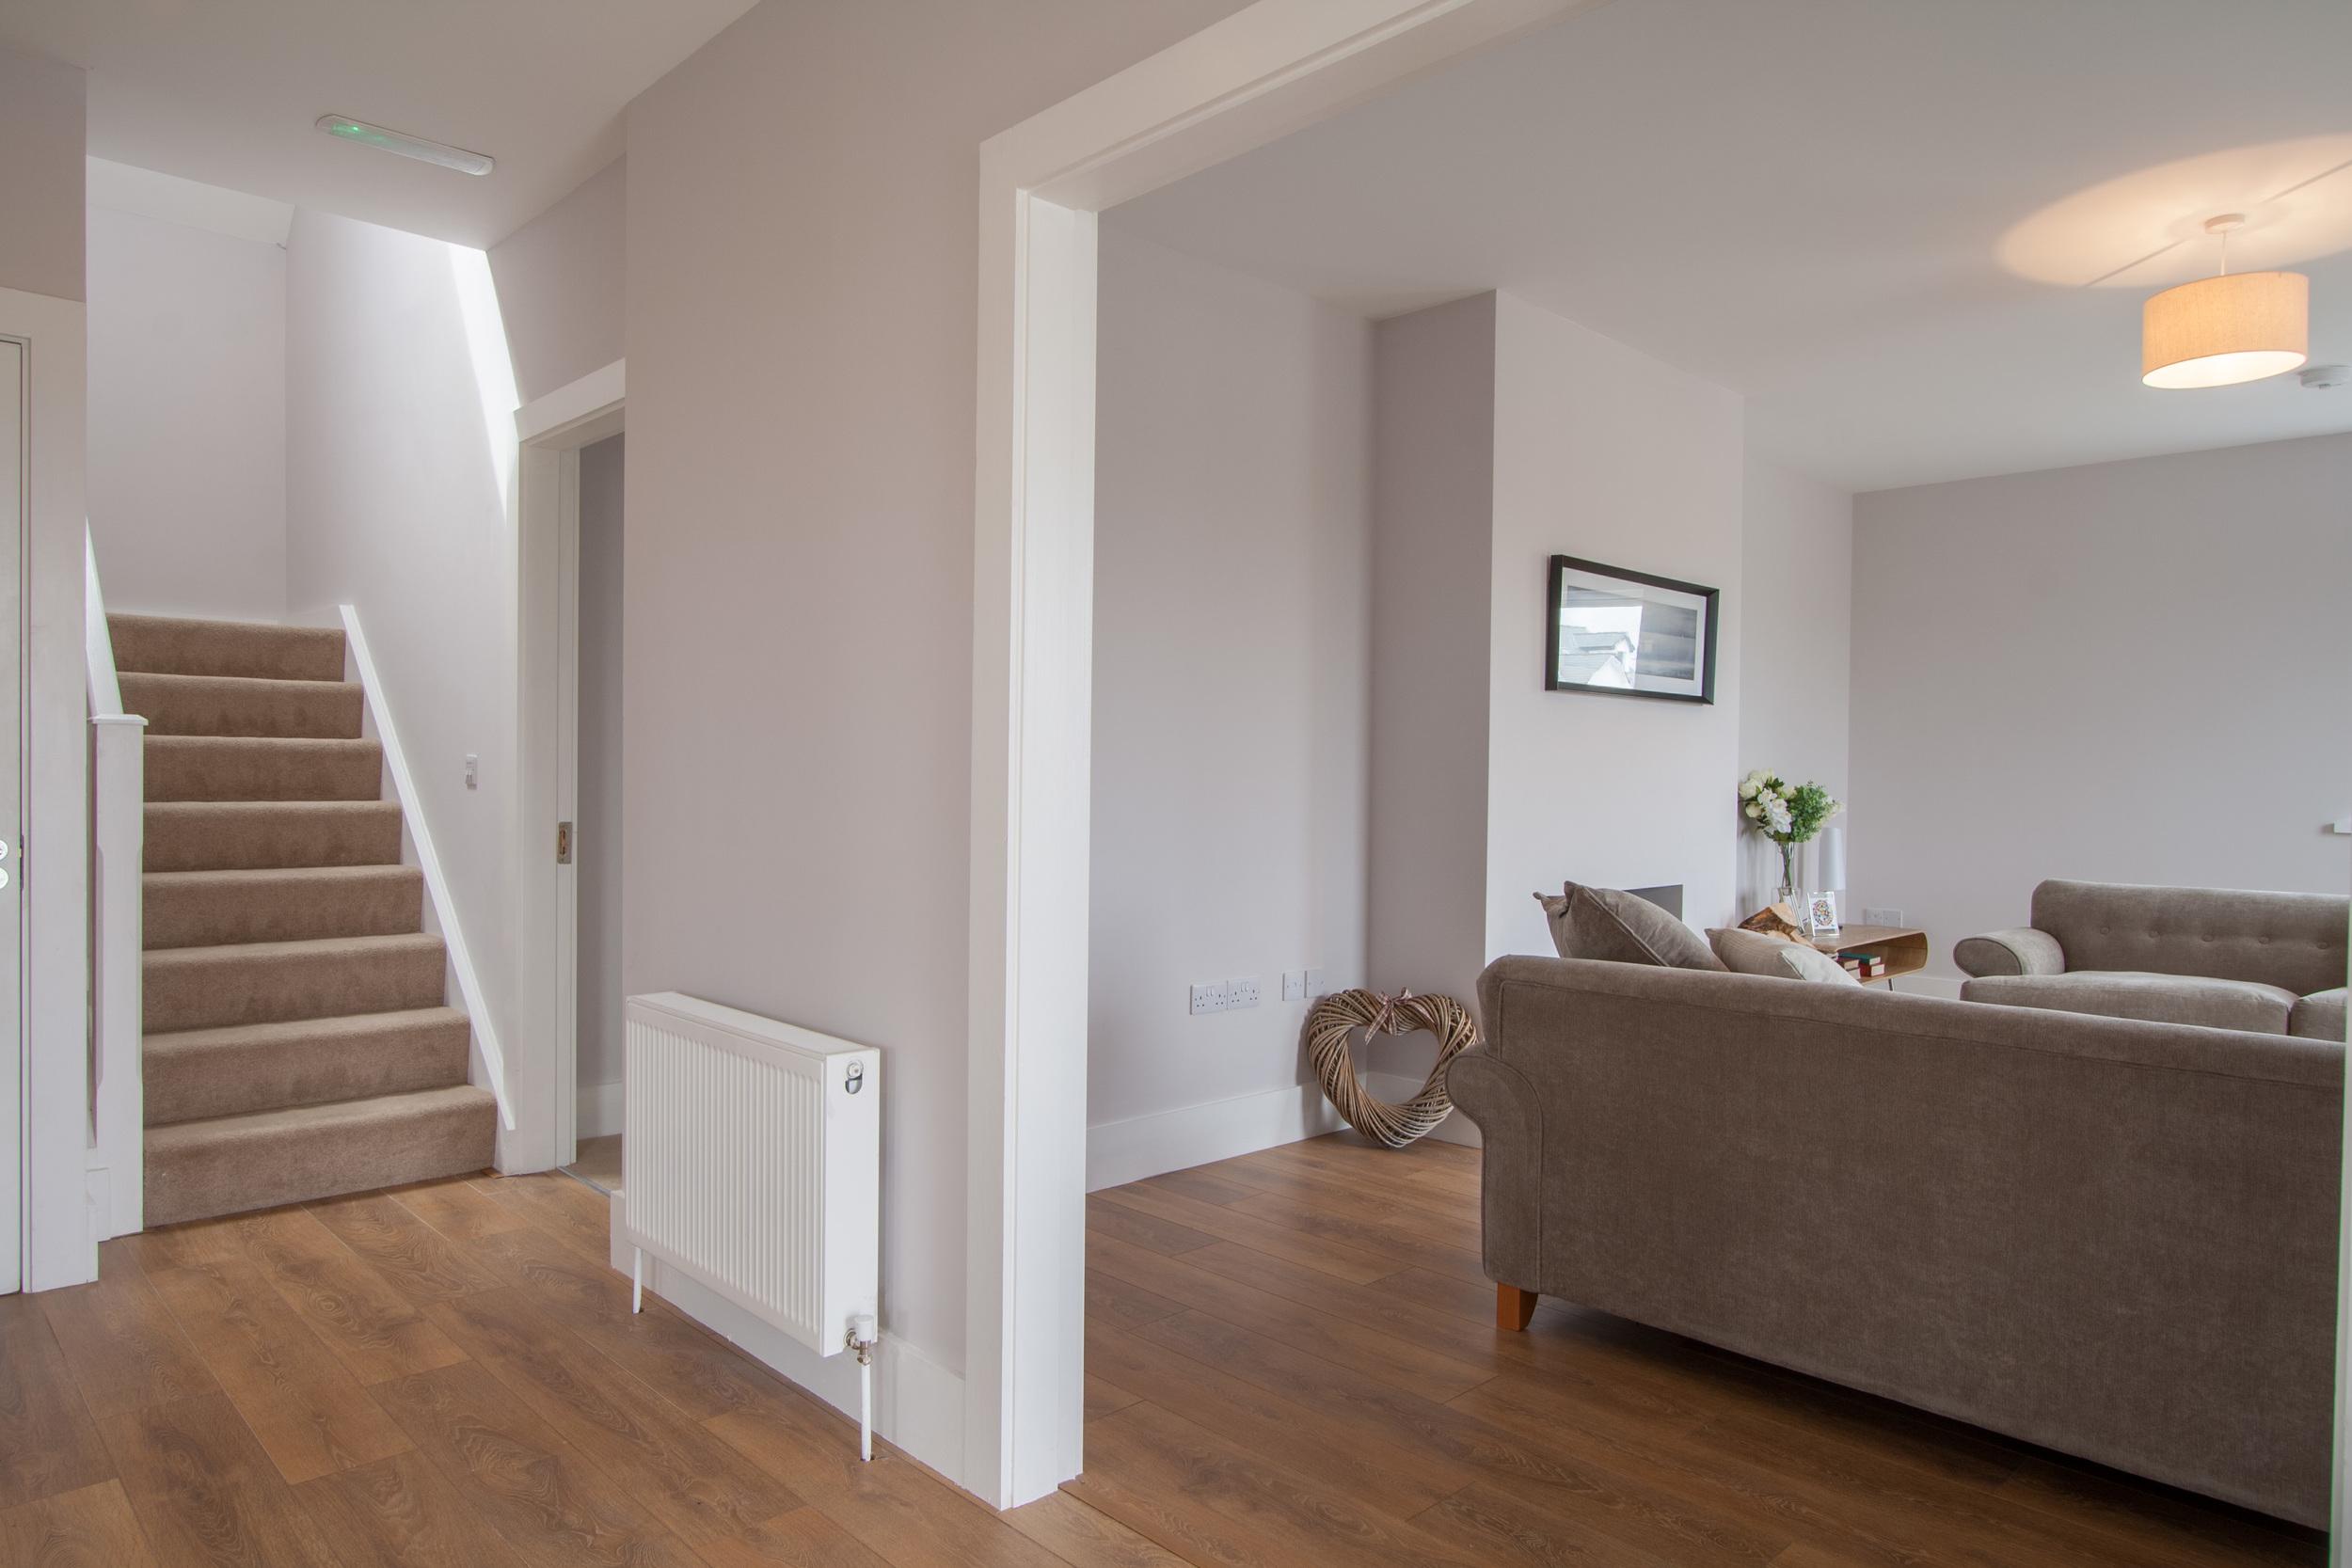 House1 - Hallway3.jpg